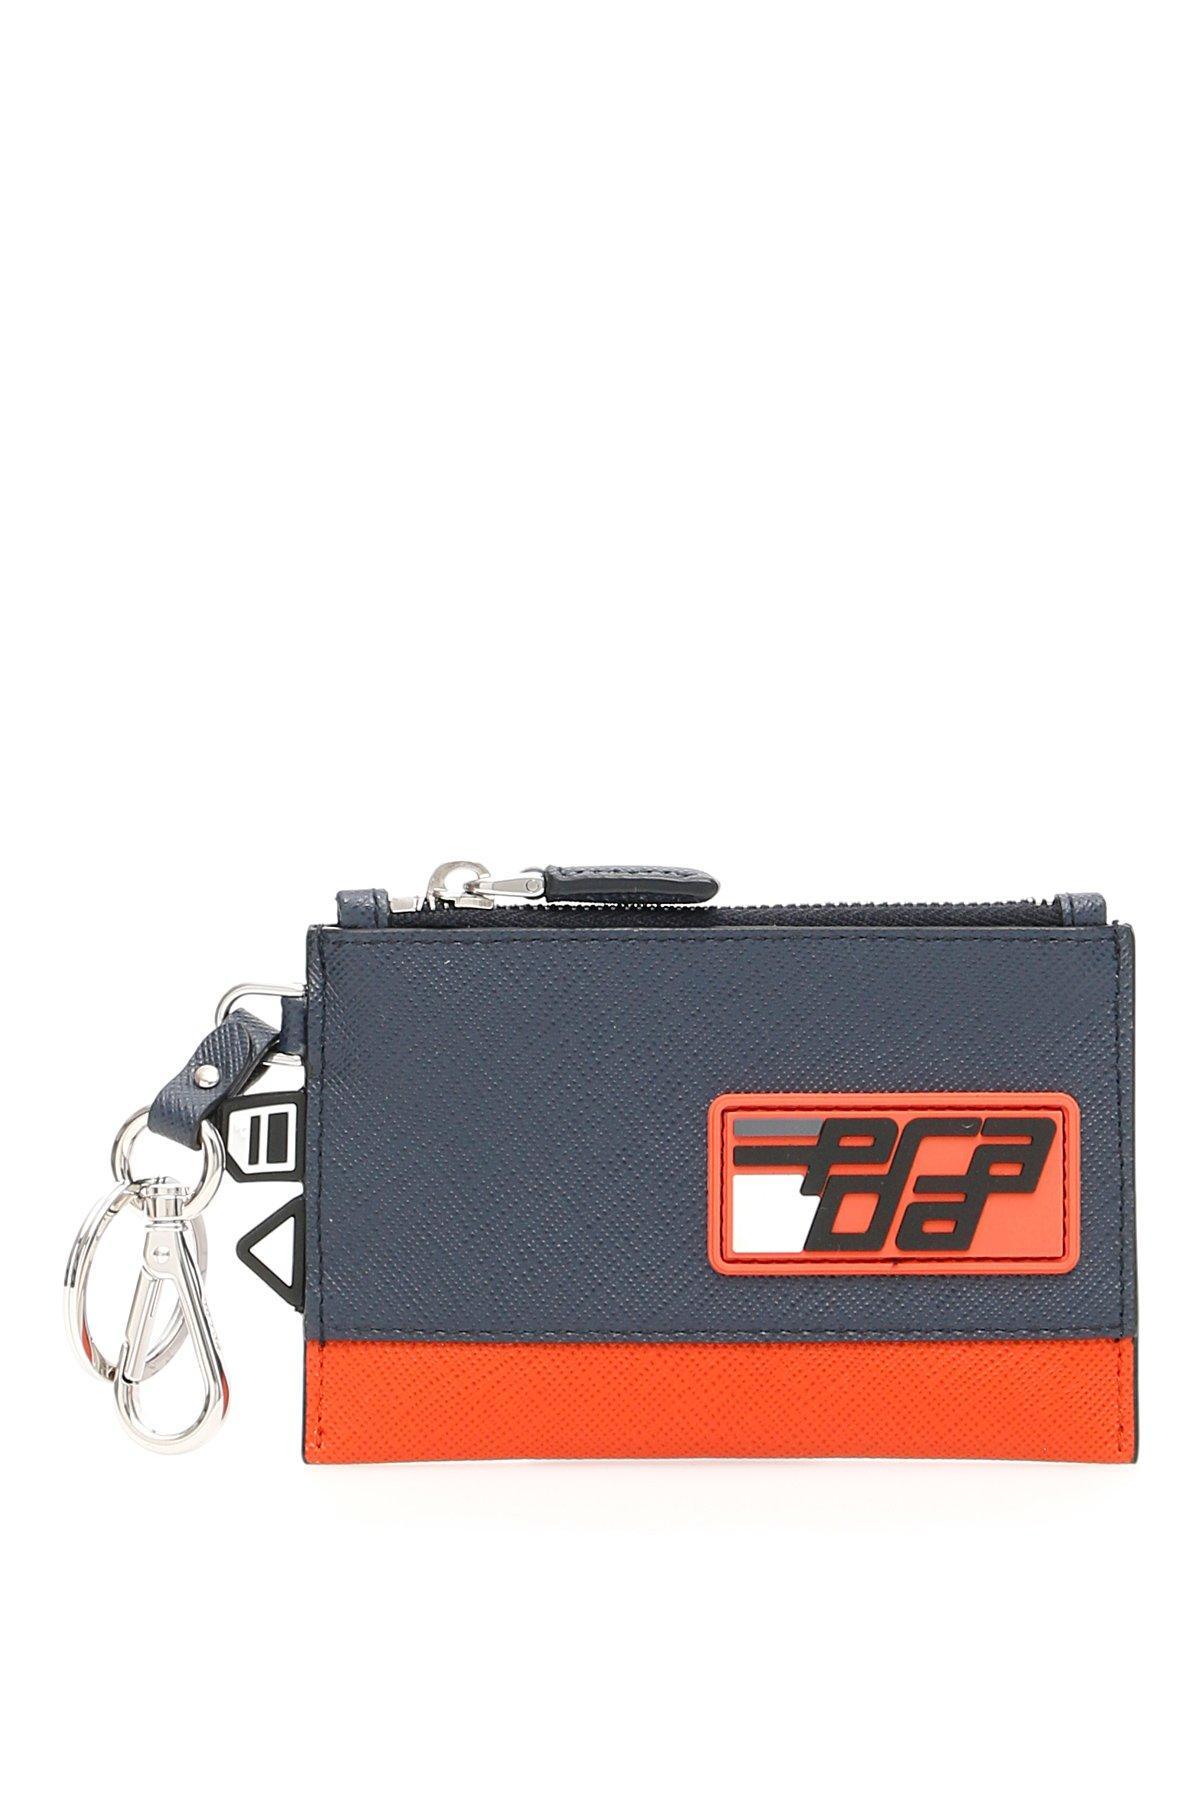 b53f2f1c9daf0c Prada Rubber Logo Patch Zipped Wallet in Blue for Men - Lyst